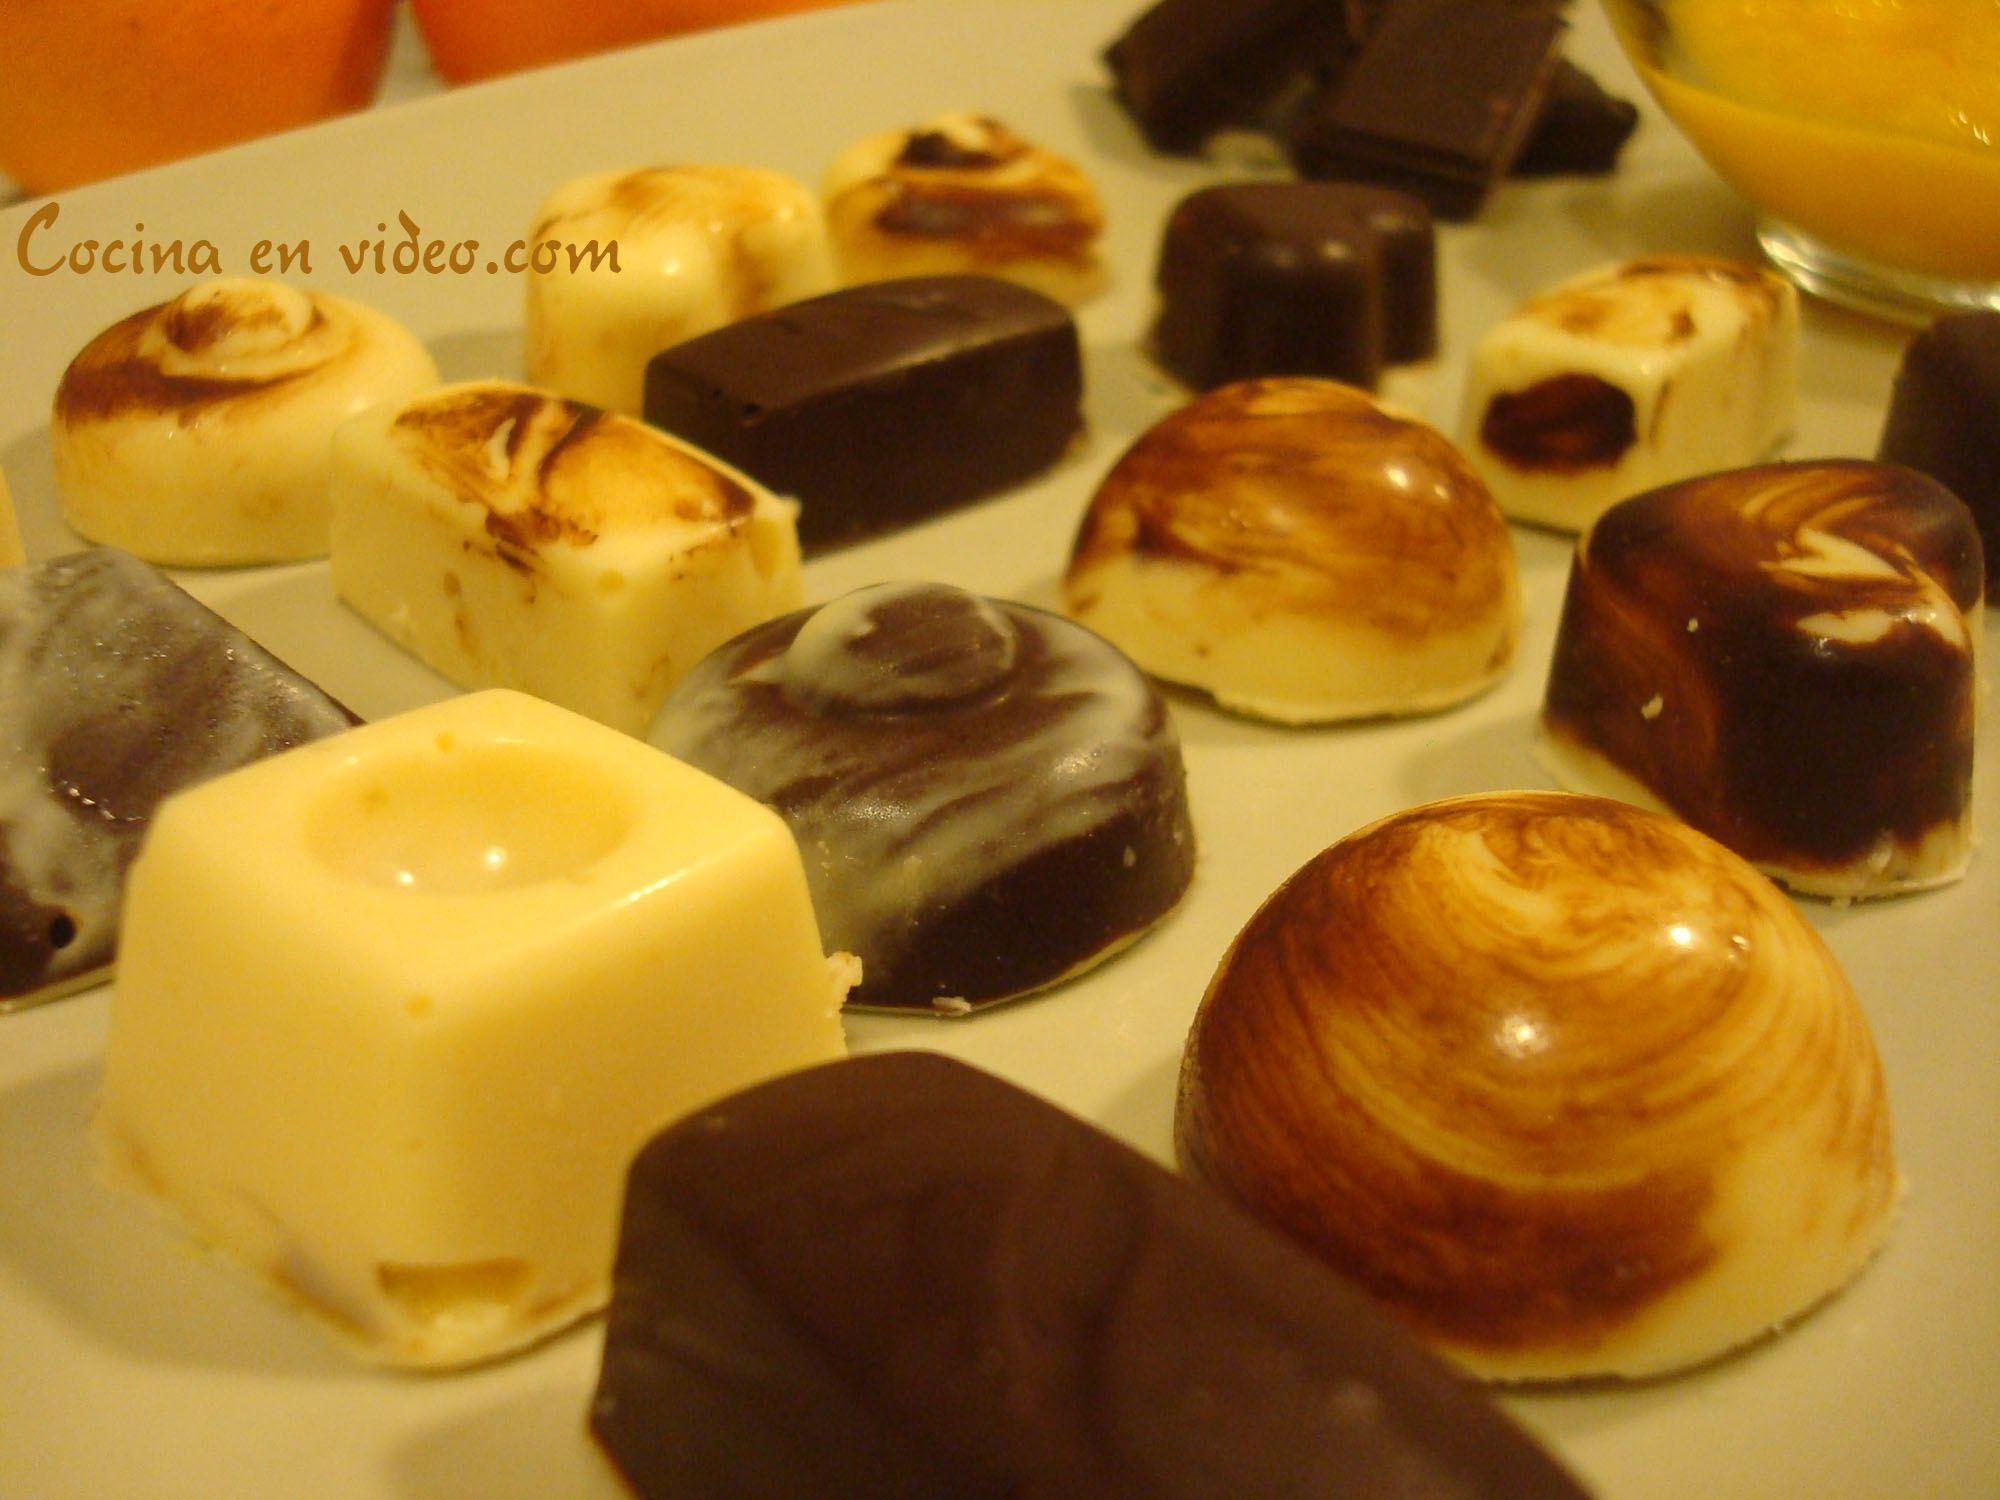 Crema Chocolate Relleno Bombones Rellenos de Crema de